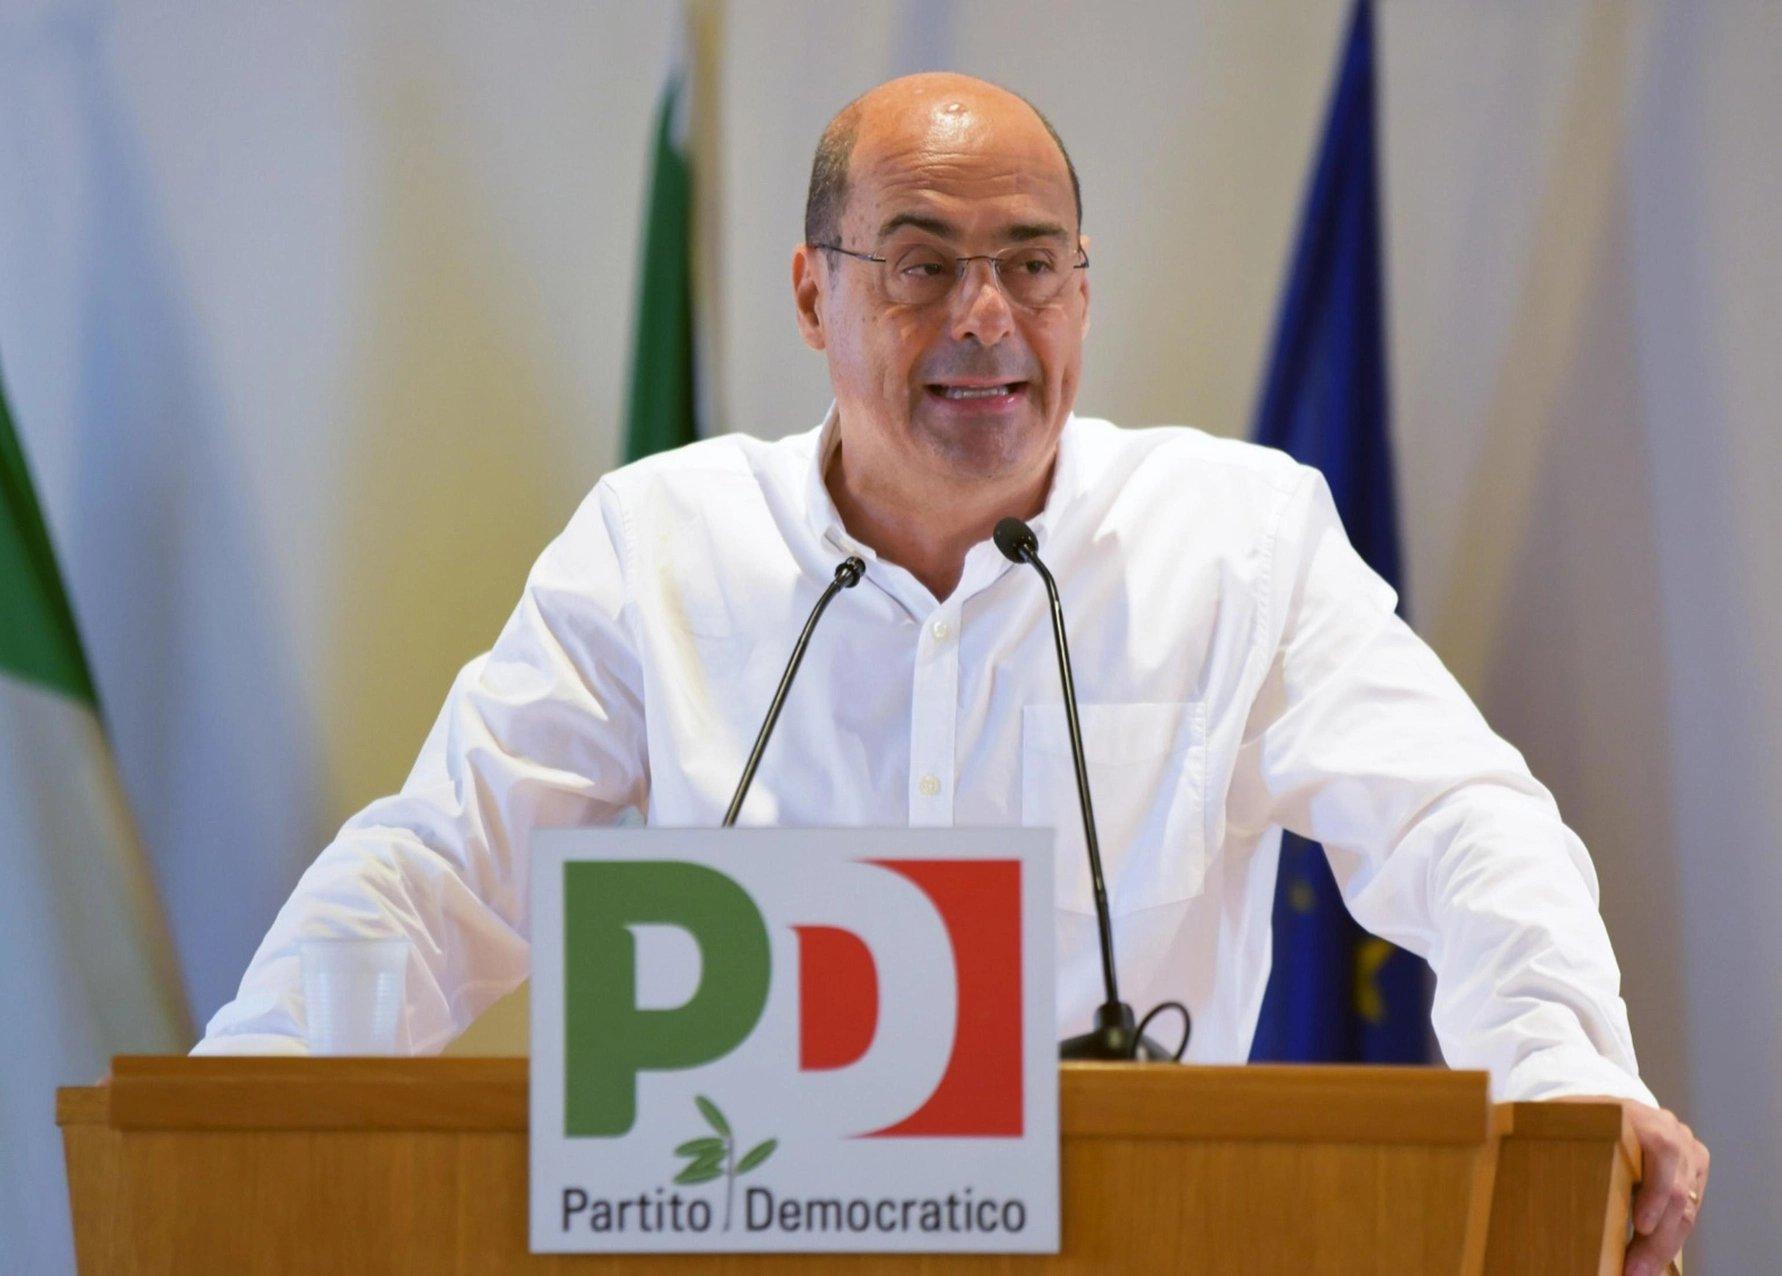 nicola-zingaretti-dimissioni-dal-pd